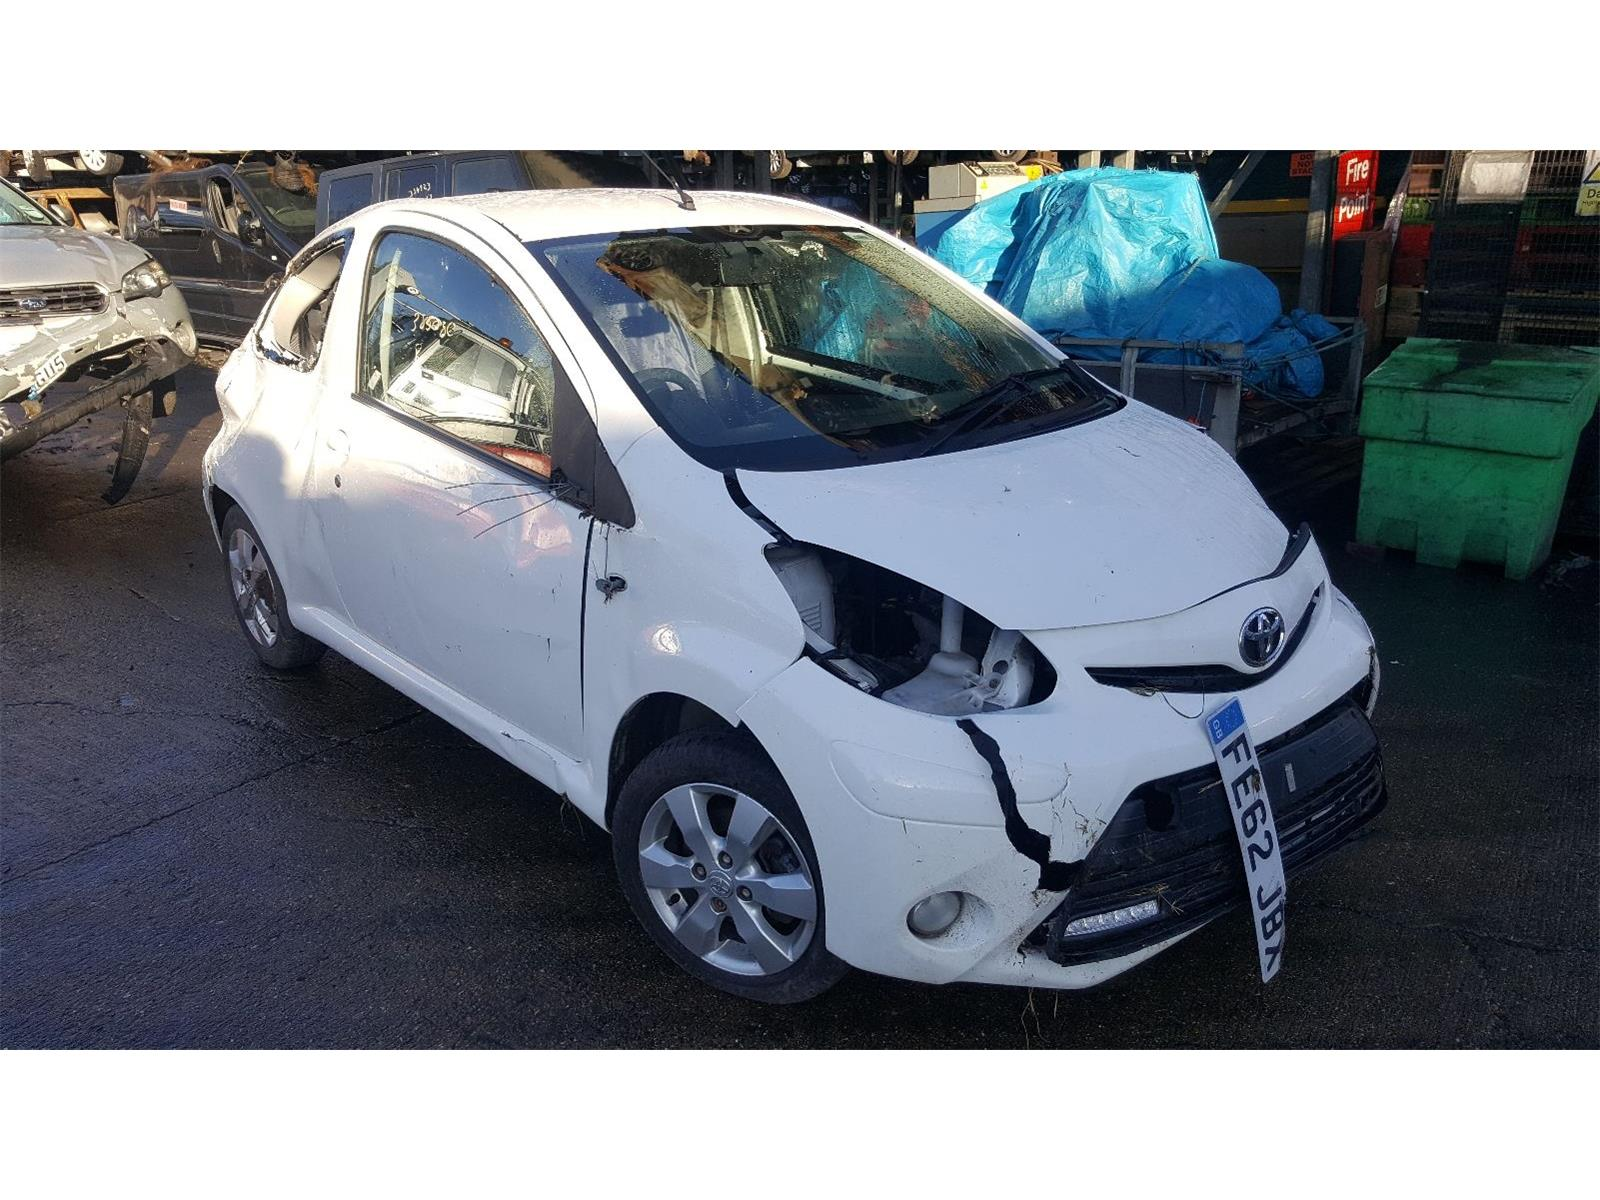 Toyota Aygo 2012 To 2014 Fire A C 3 Door Hatchback Scrap Salvage Yaris Fuse Box Year Ref